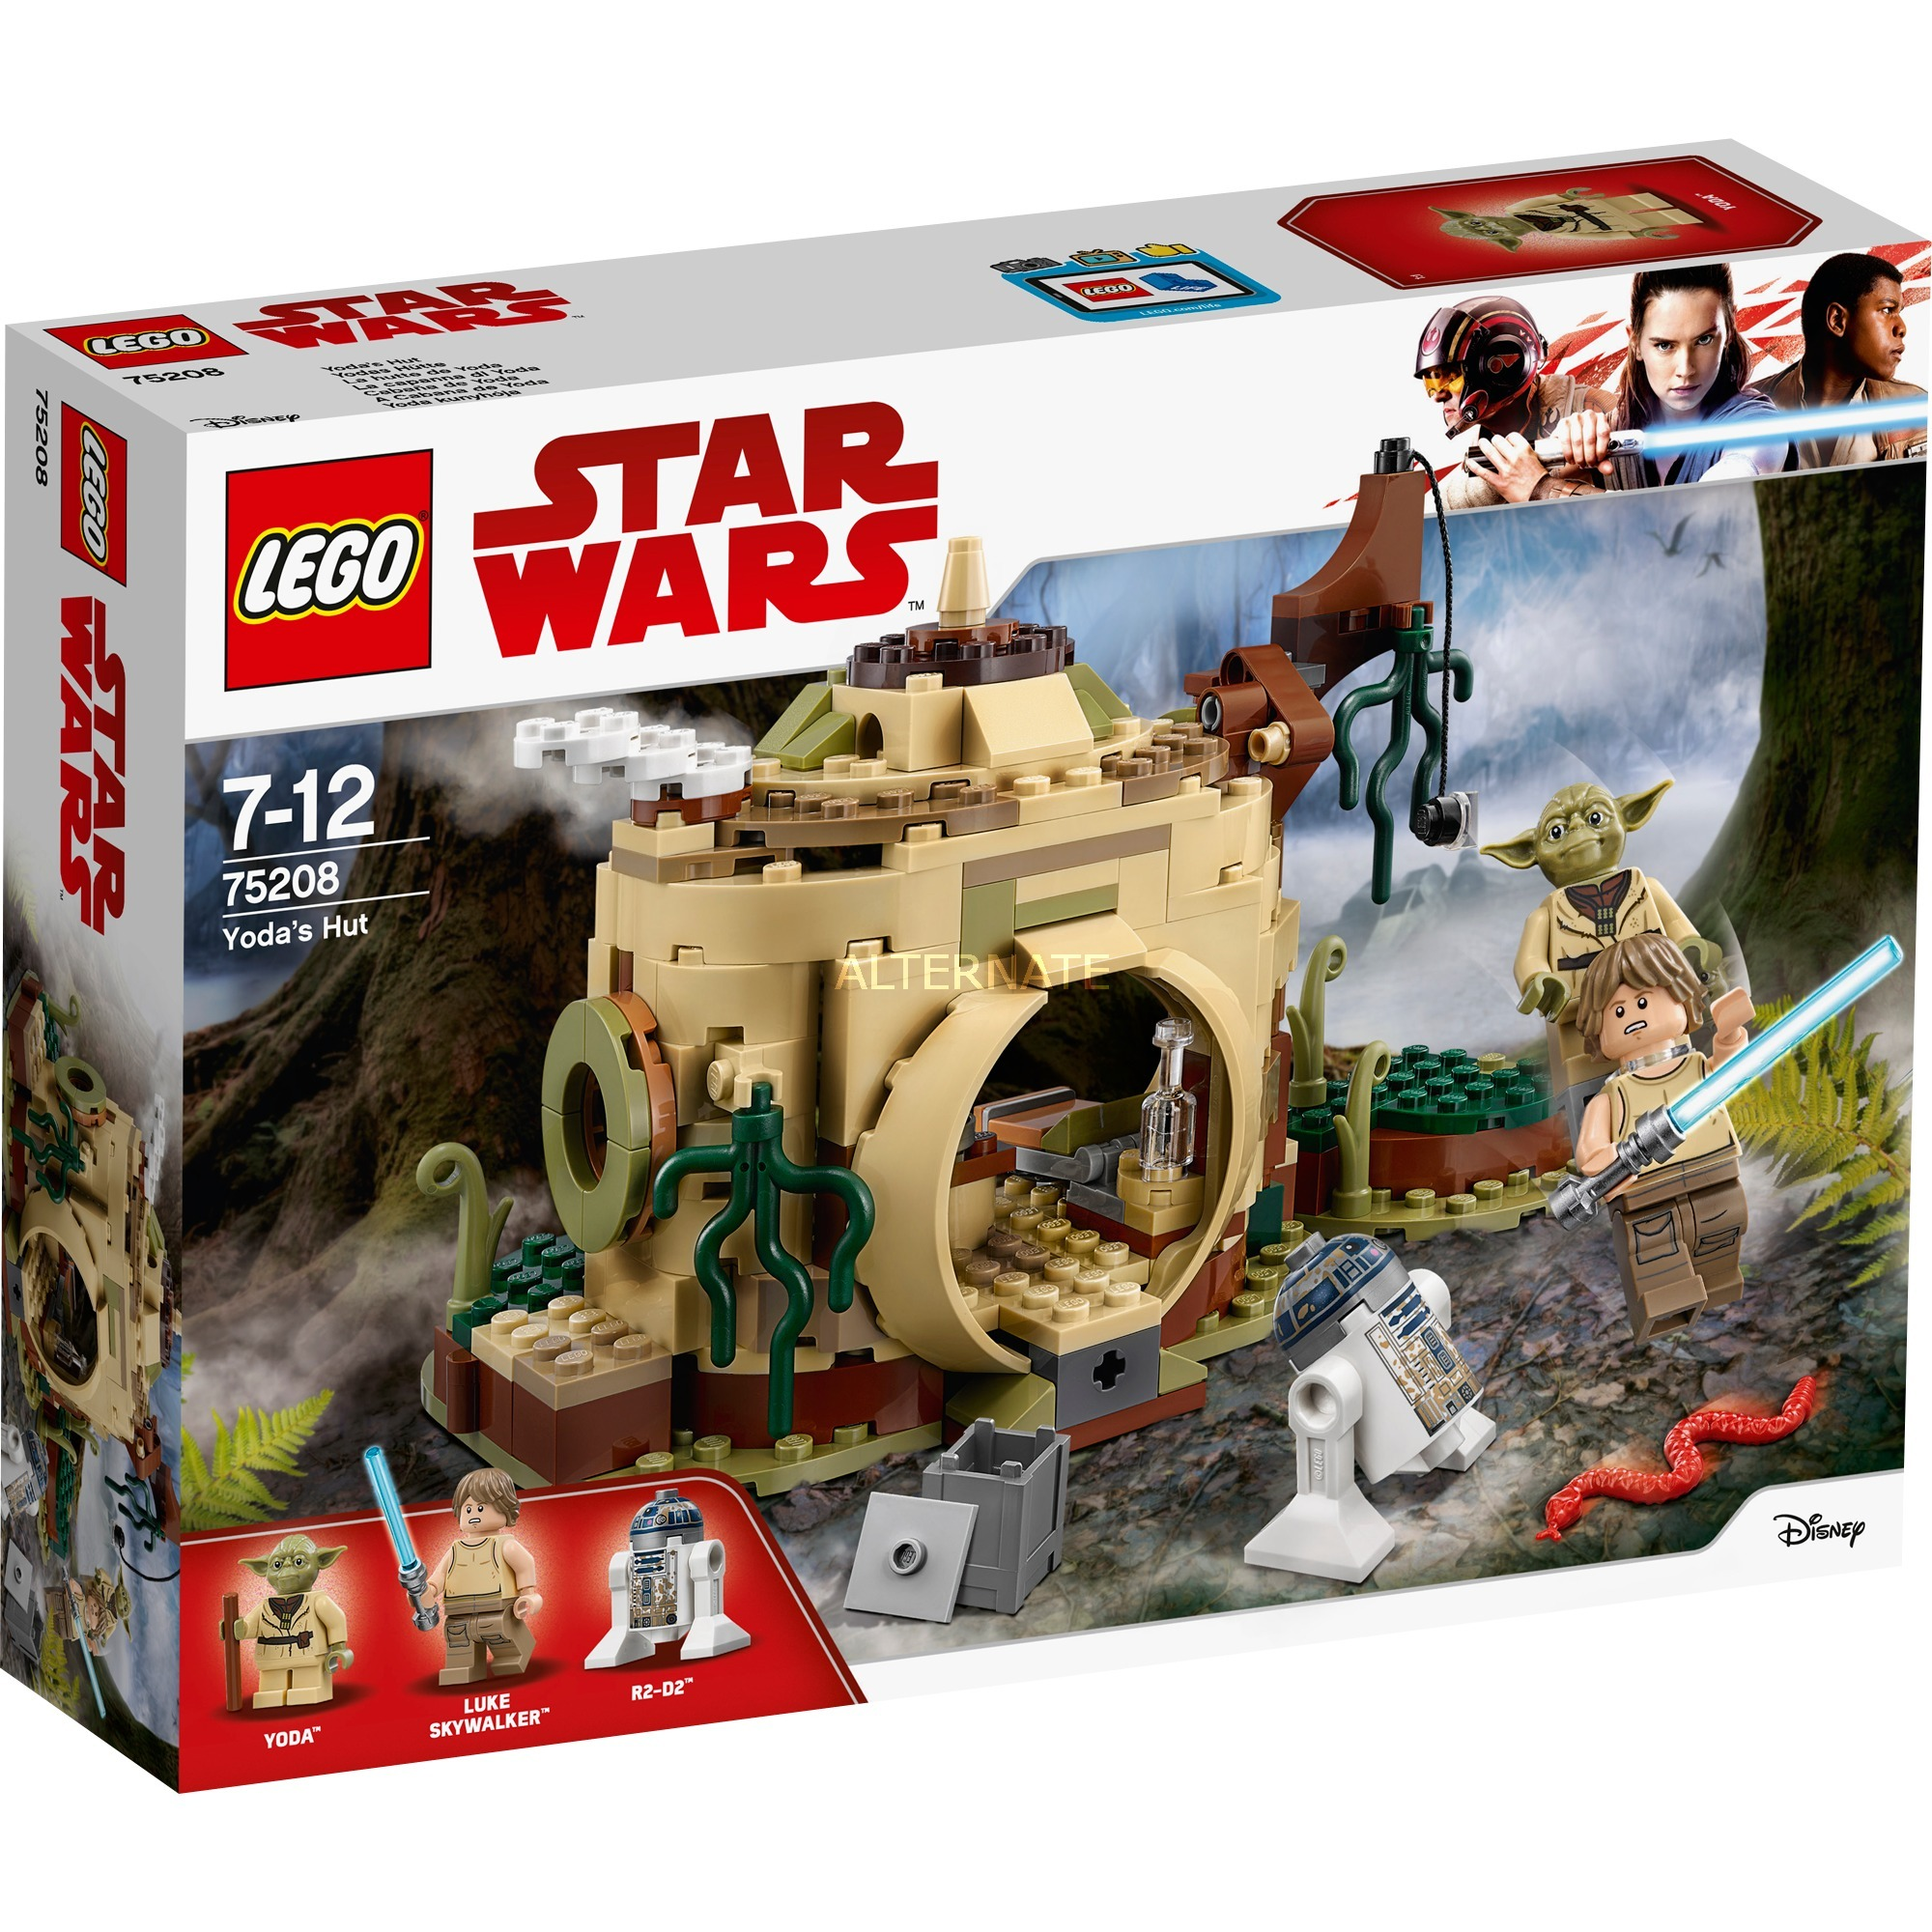 STAR WARS 75208 La hutte de Yoda, Jouets de construction